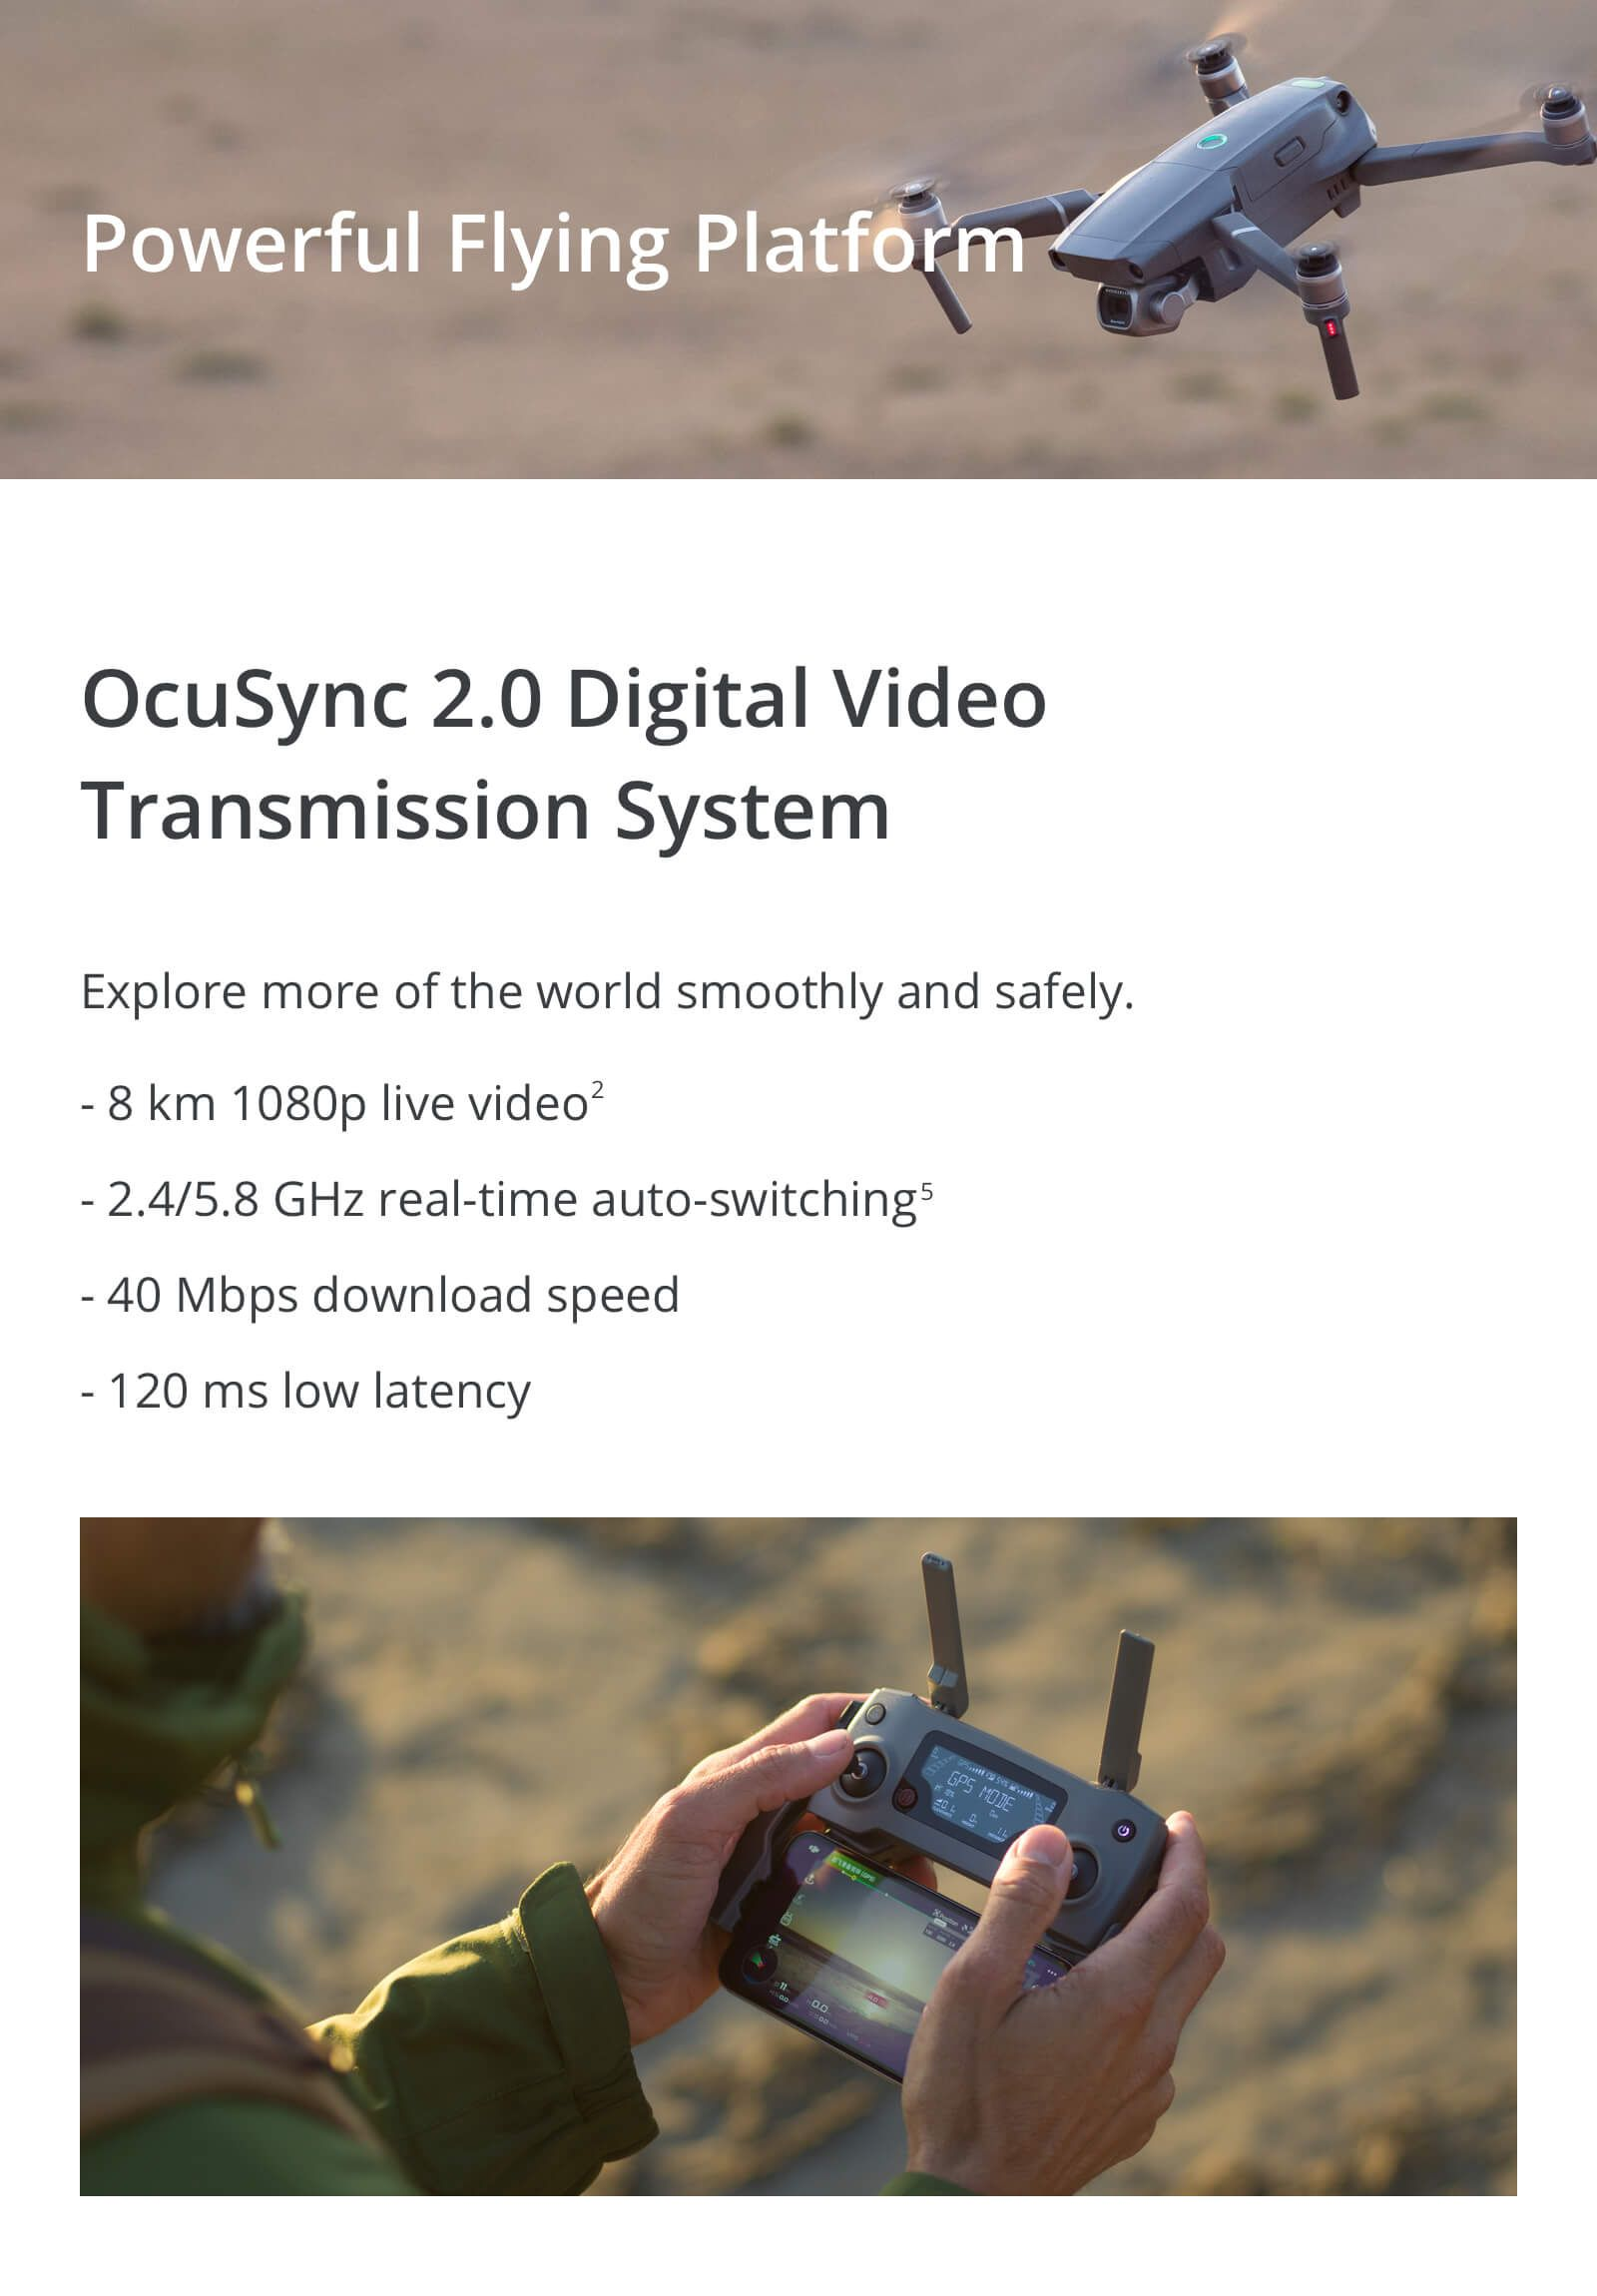 d785e675b31 Pin by Anton van Niekerk on DJI Mavic 2 Pro | Mavic, Rc drone, Camera